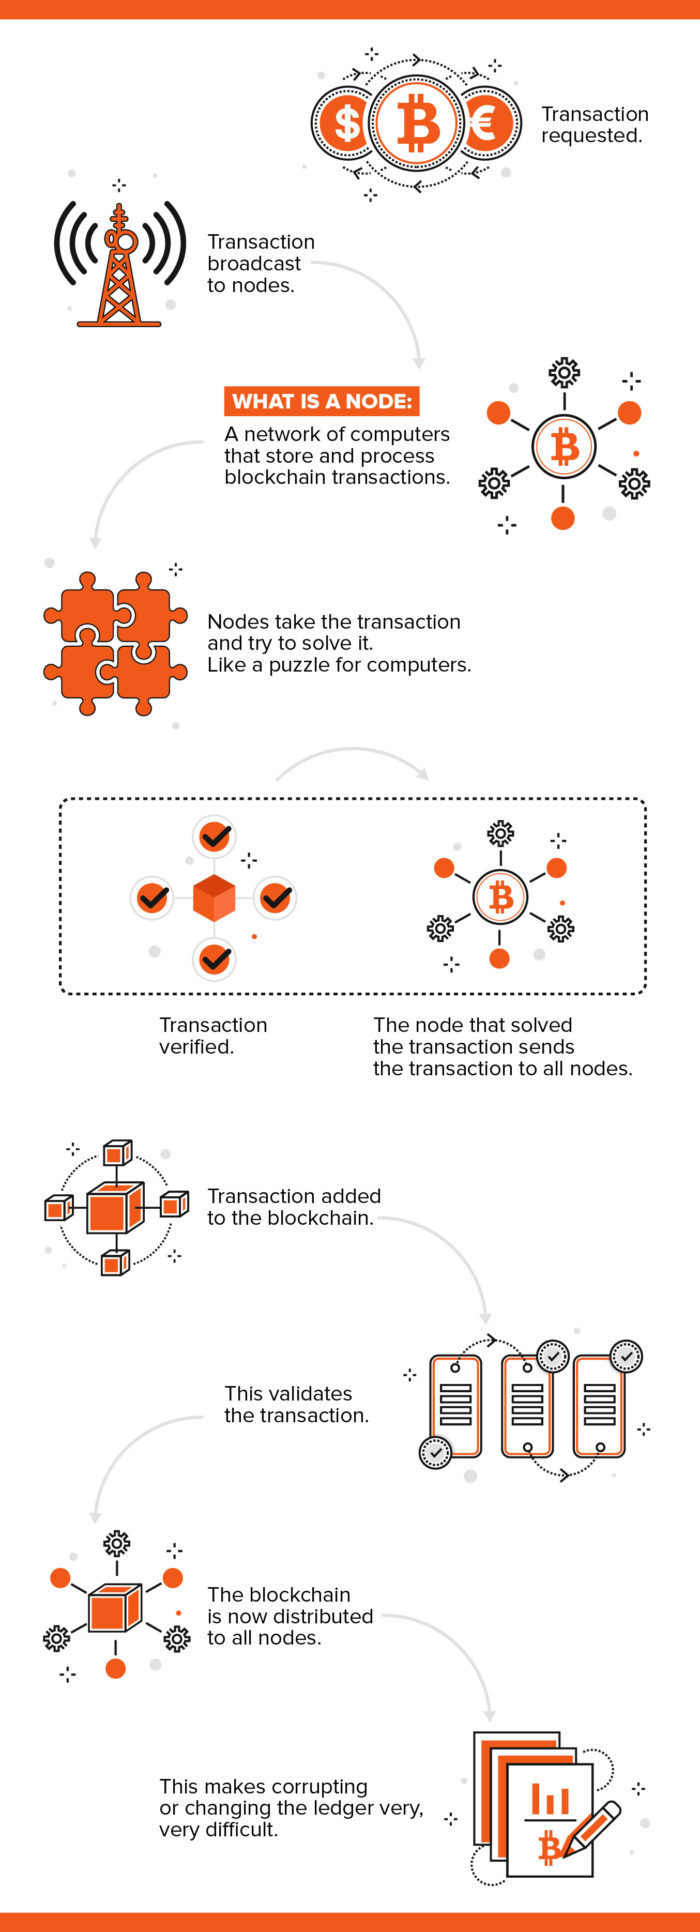 The blockchain process infographic